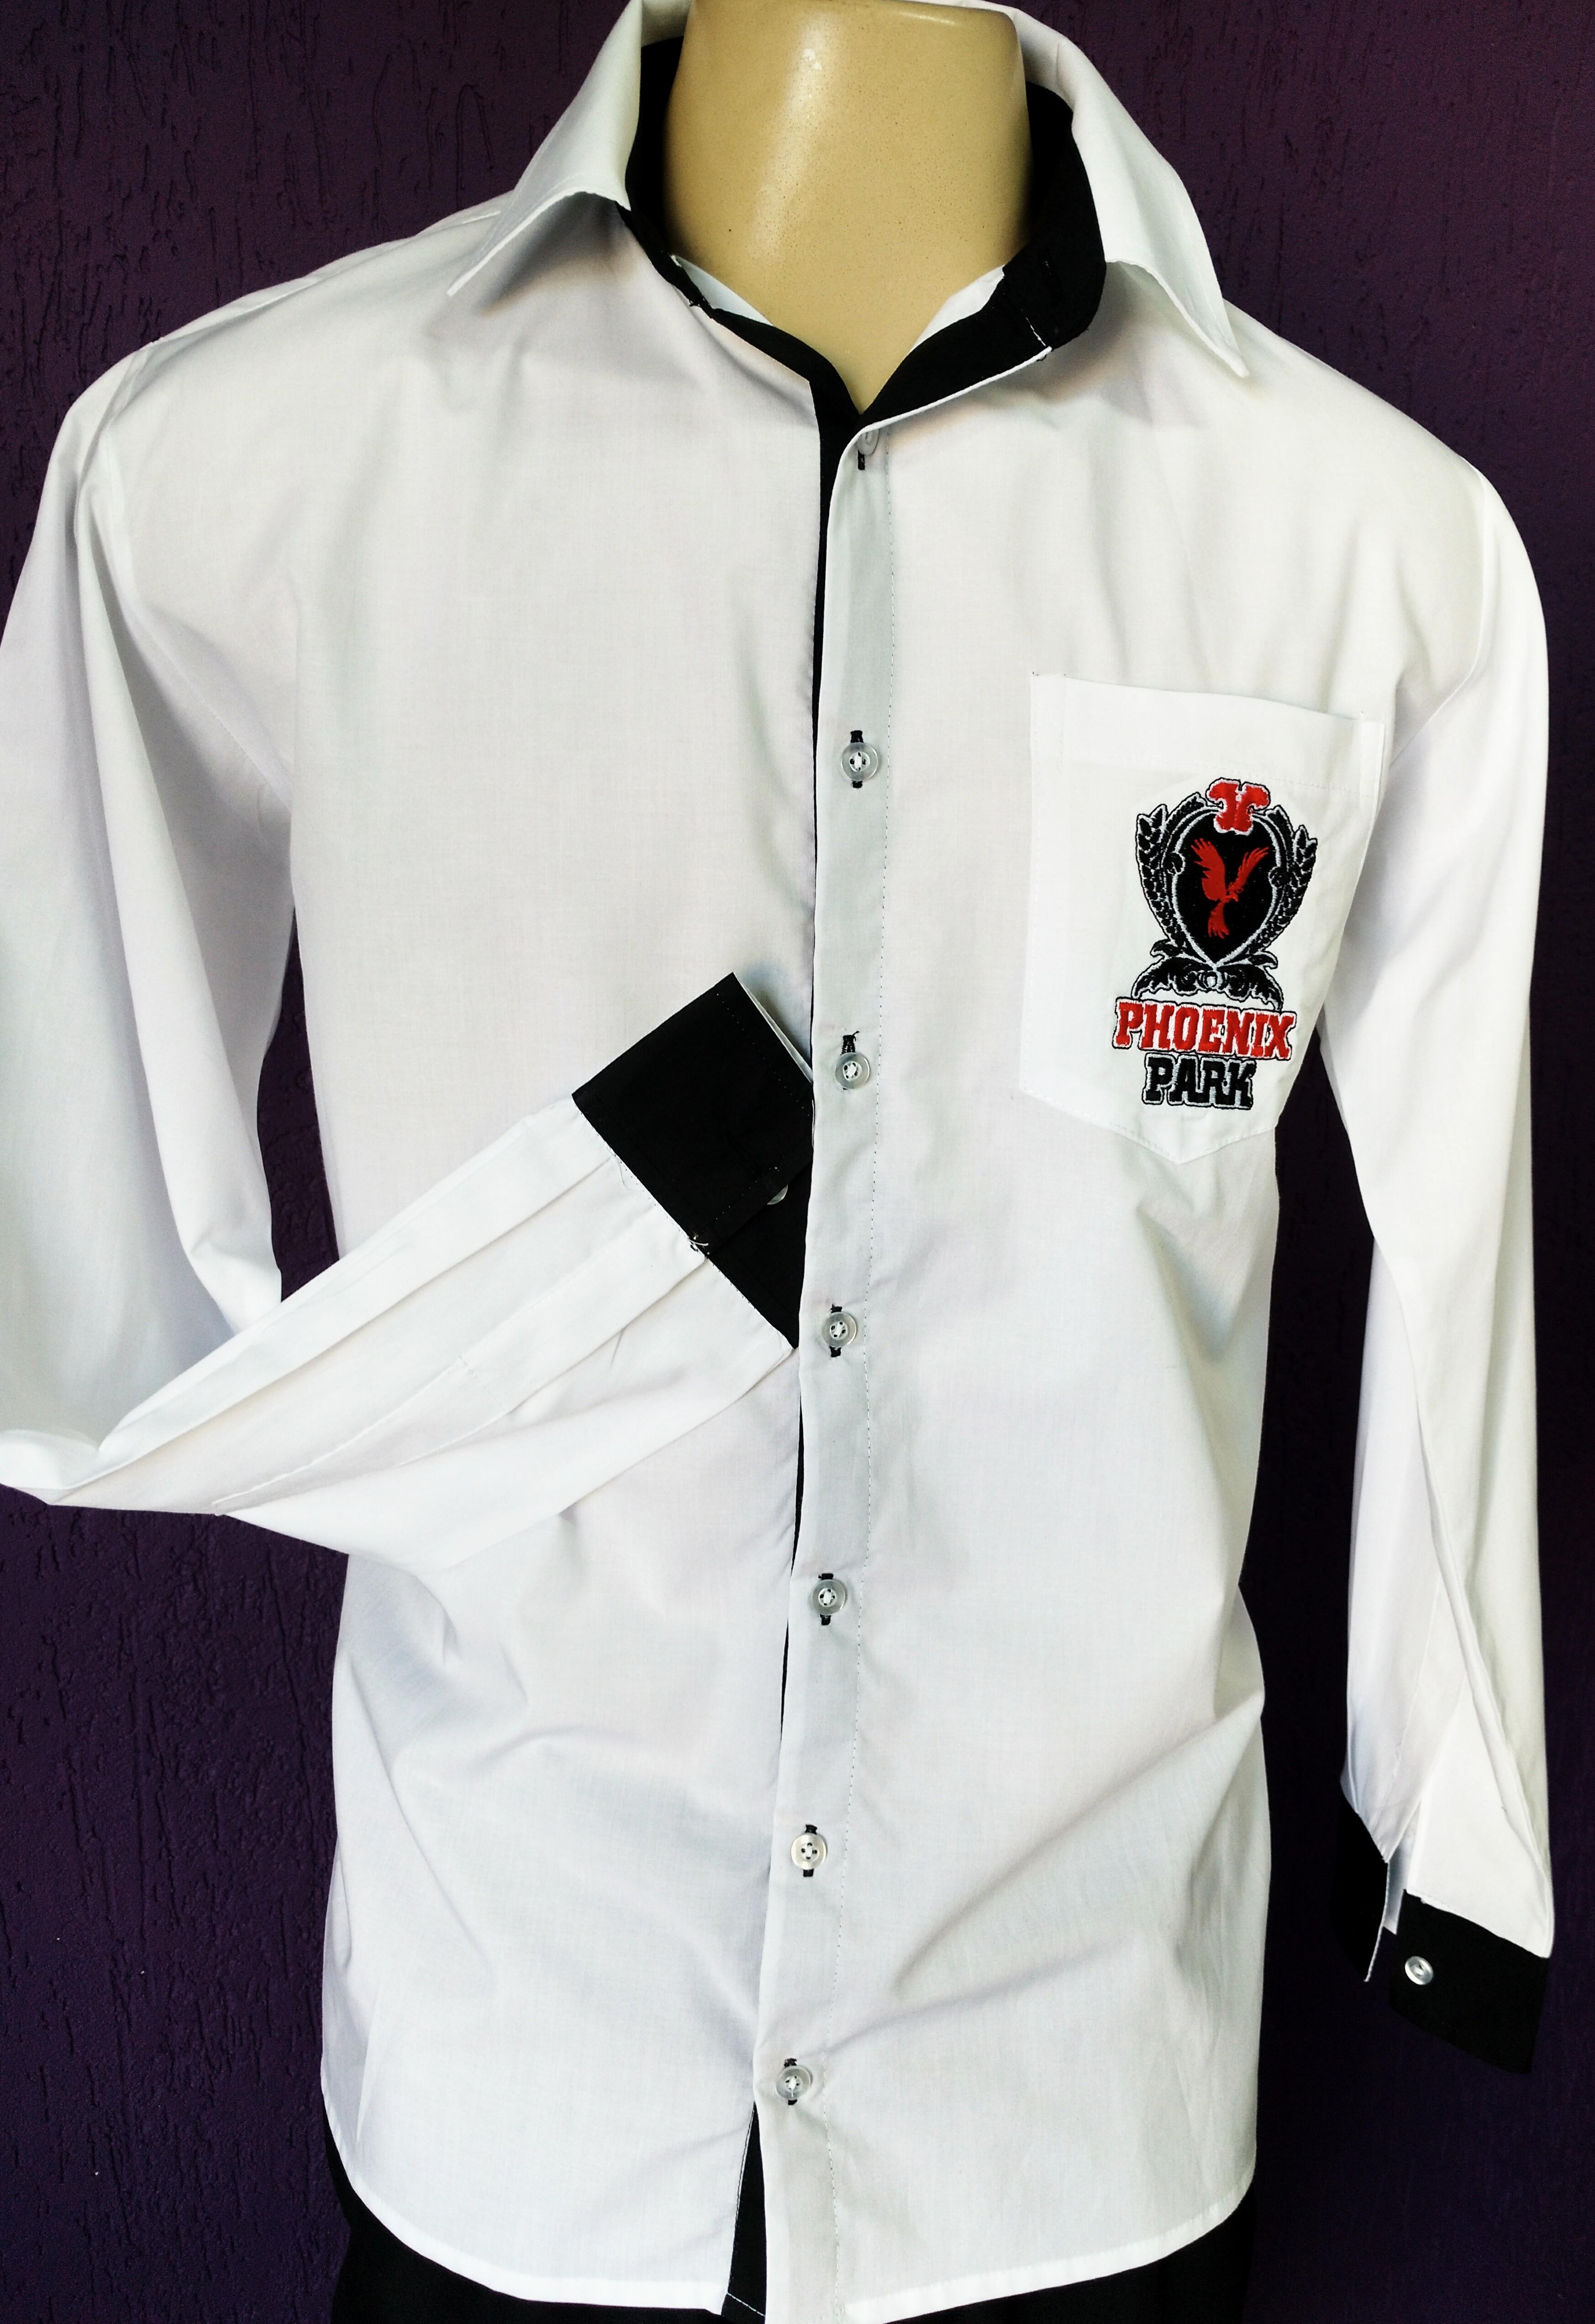 Camisa Phoenix Park